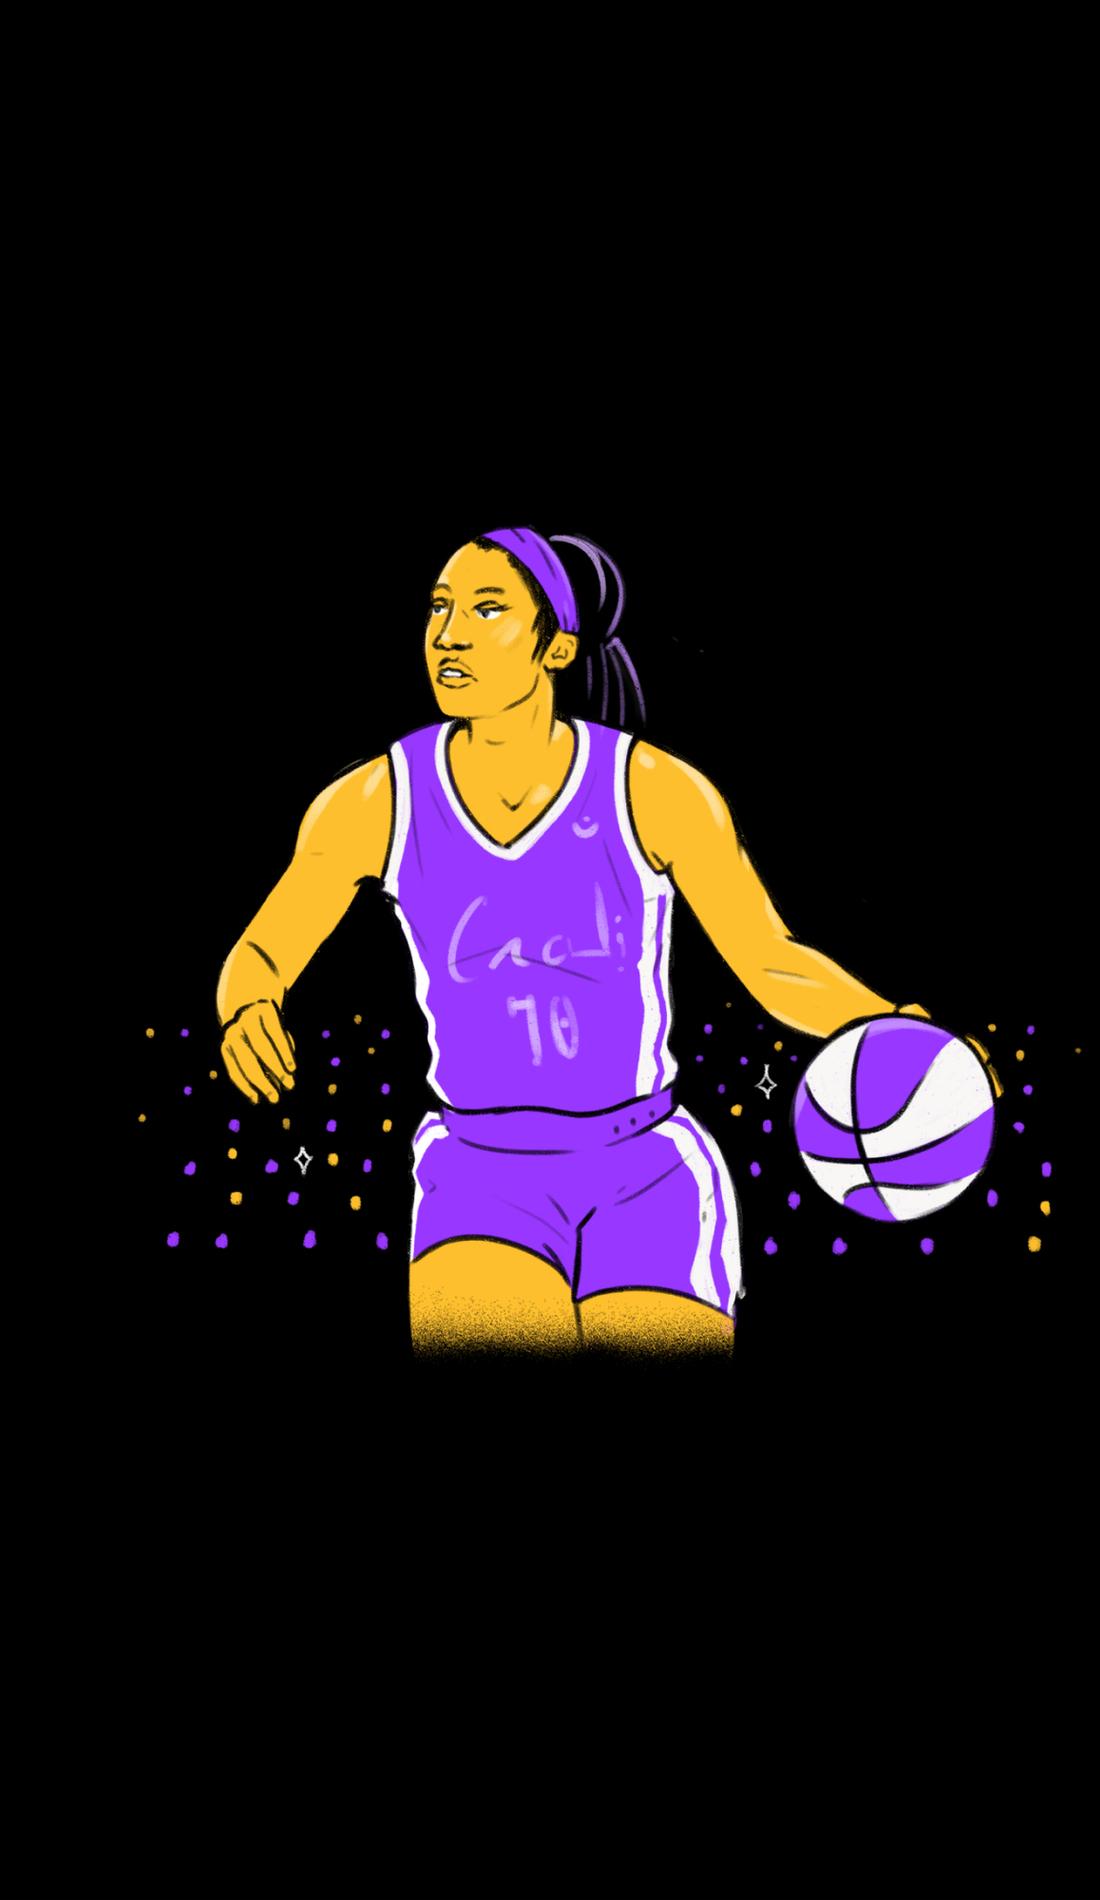 A Virginia Tech Hokies Womens Basketball live event